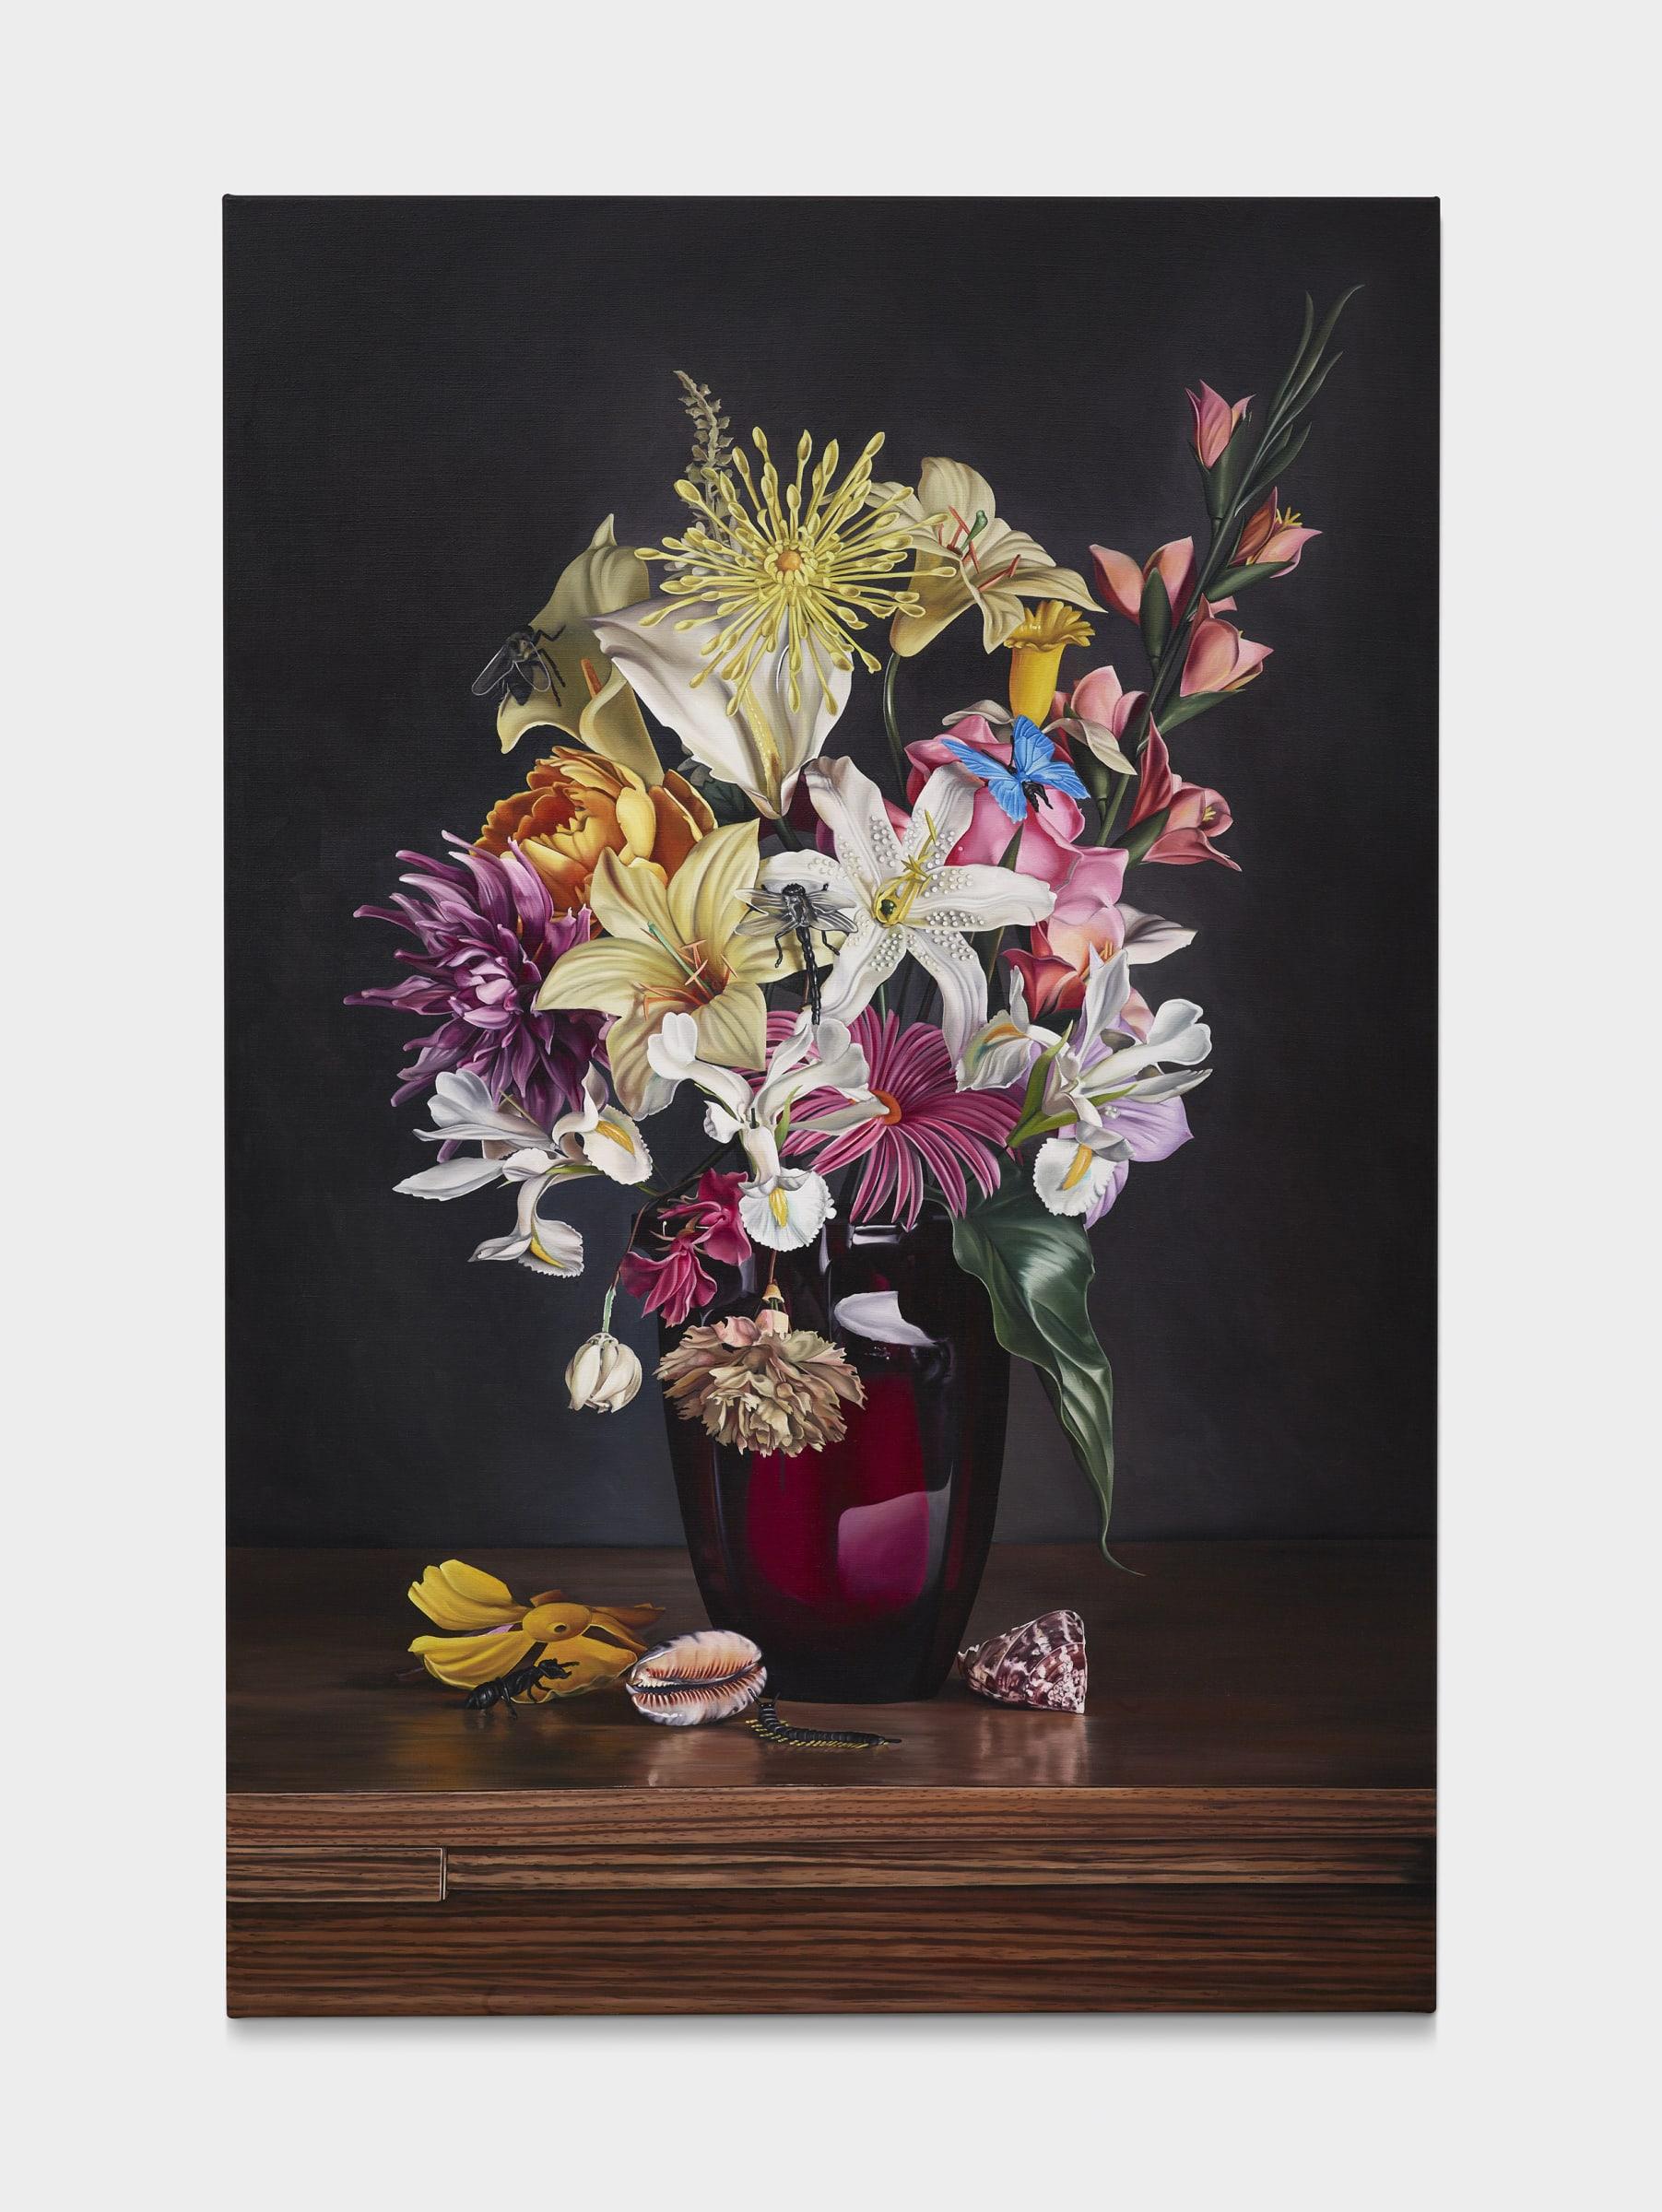 "<span class=""link fancybox-details-link""><a href=""/exhibitions/91/works/artworks11244/"">View Detail Page</a></span><div class=""artist""><strong>Till RABUS</strong></div><div class=""title""><em>Plastic flowers 1</em>, 2019</div><div class=""medium"">oil on canvas</div><div class=""dimensions"">150 x 100 cm<br>59 1/8 x 39 3/8 in</div>"